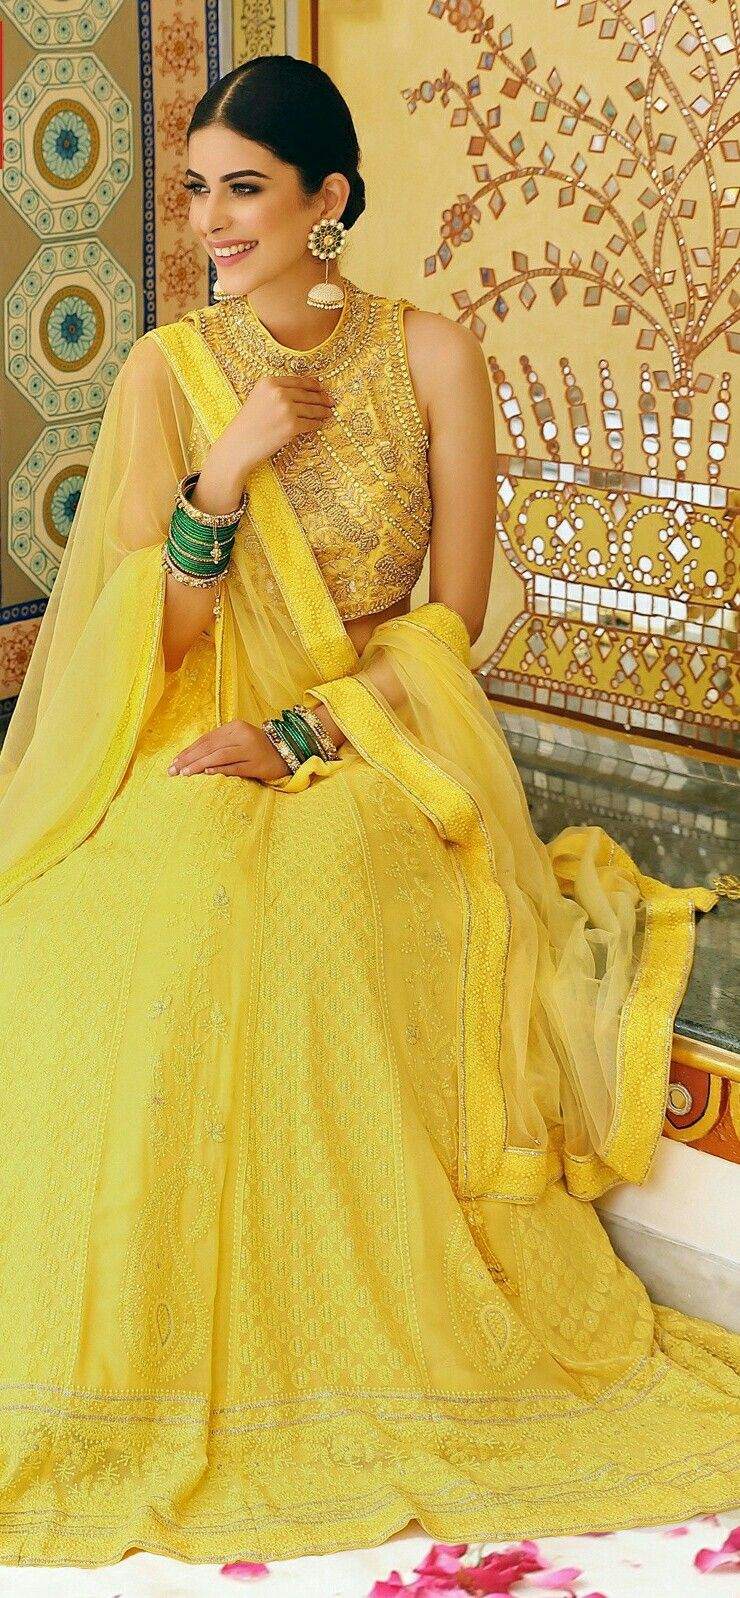 c1f11f9ffe Mehendi outfit | #Mehendi & Haldi ceremony in 2019 | Mehendi outfits ...